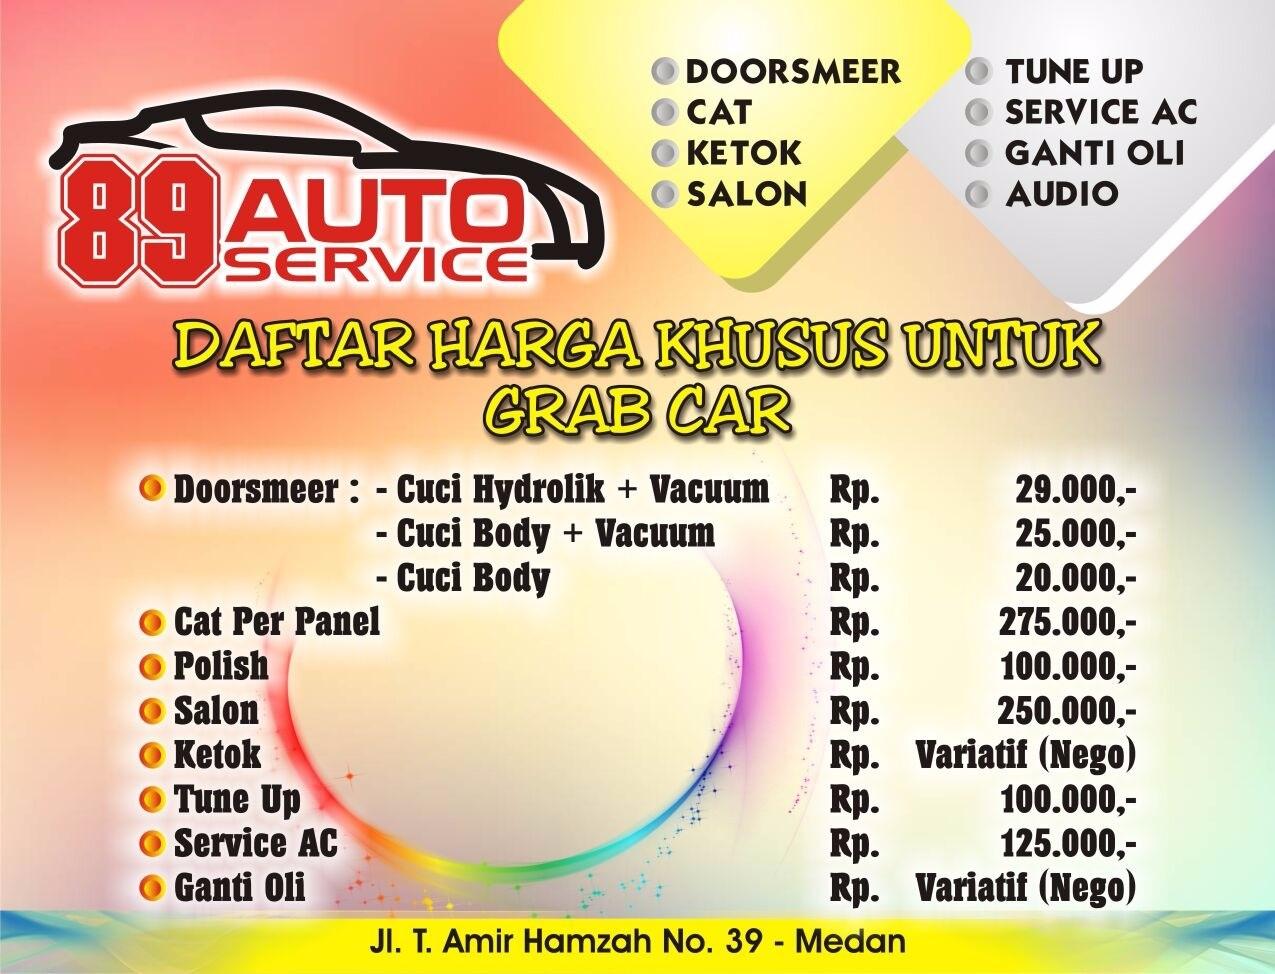 Grabcar Medan Bengkel 89 Auto Service Grab Id